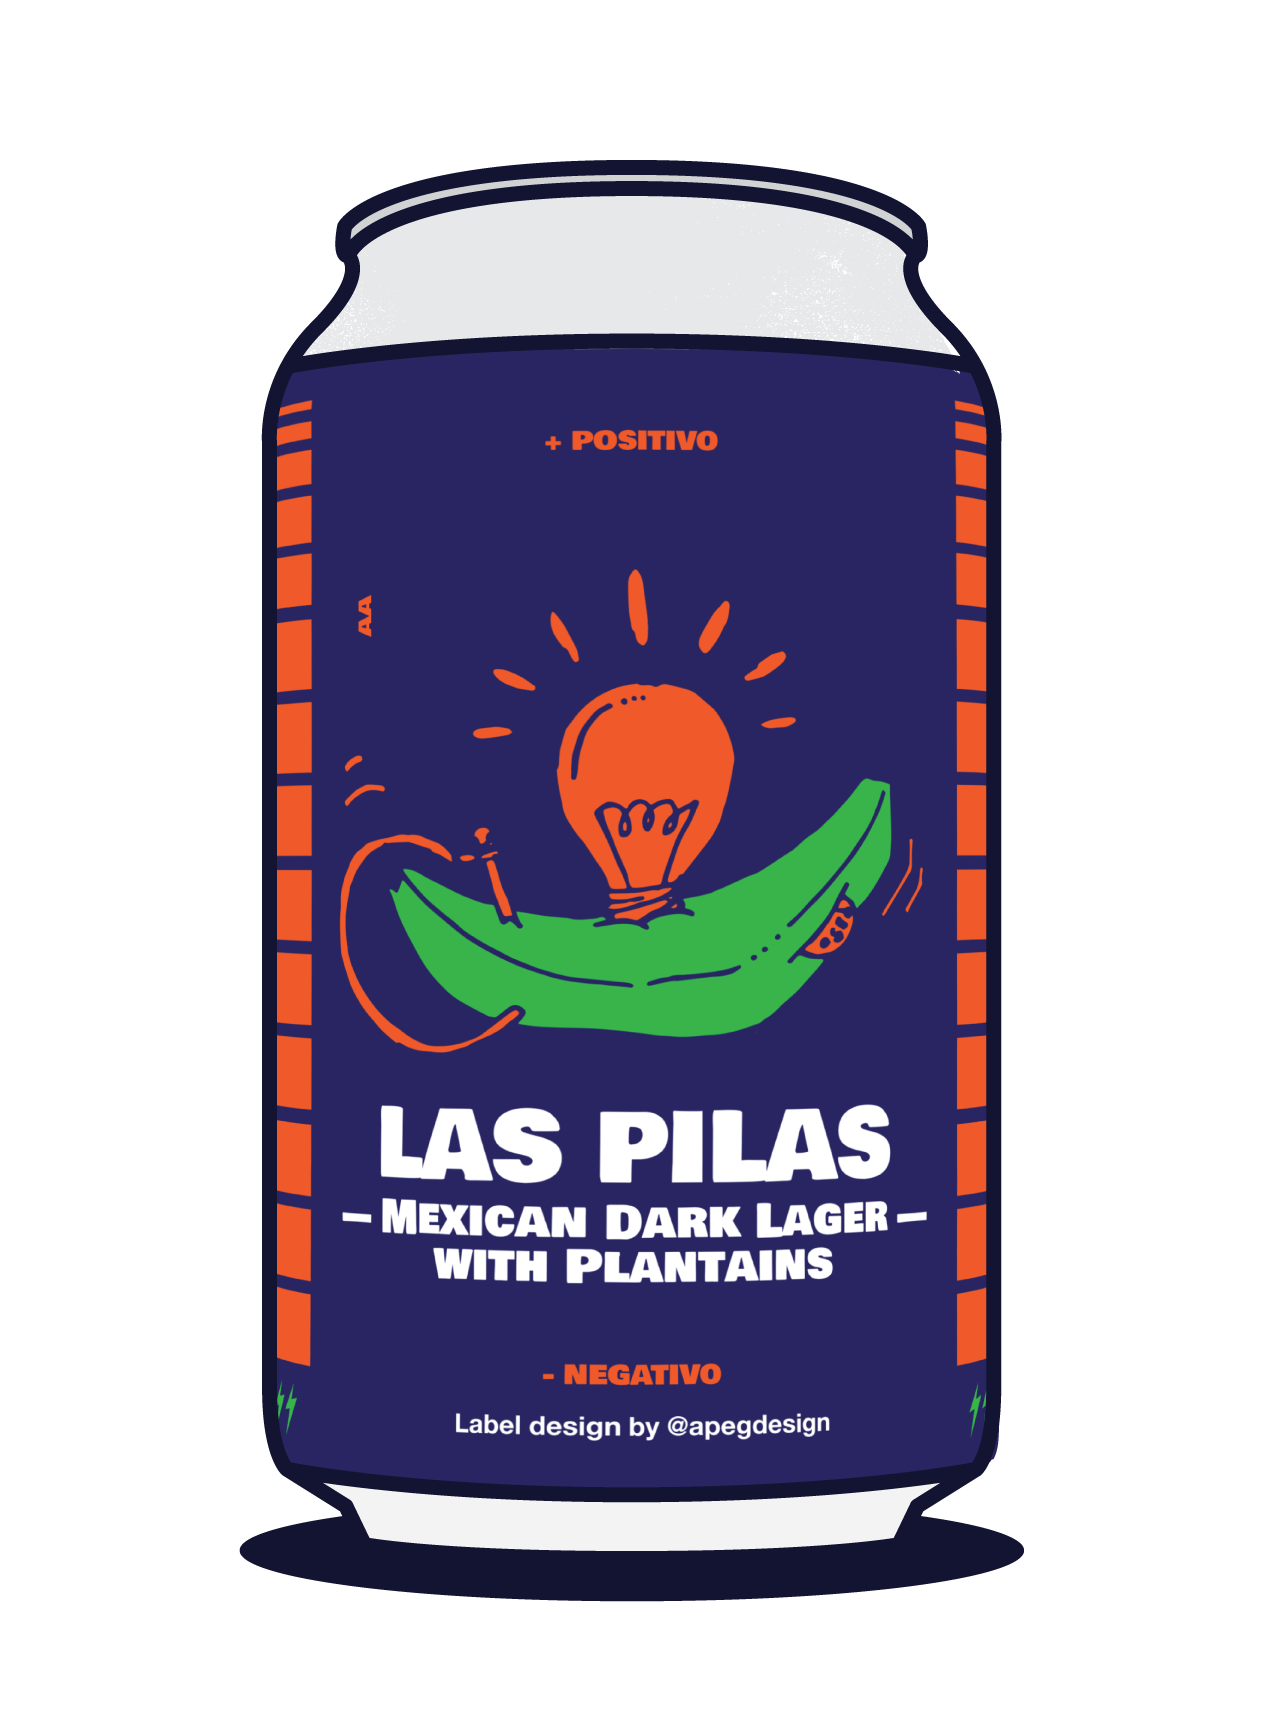 Las Pilas Hispanic Coalition Dark Lager Image